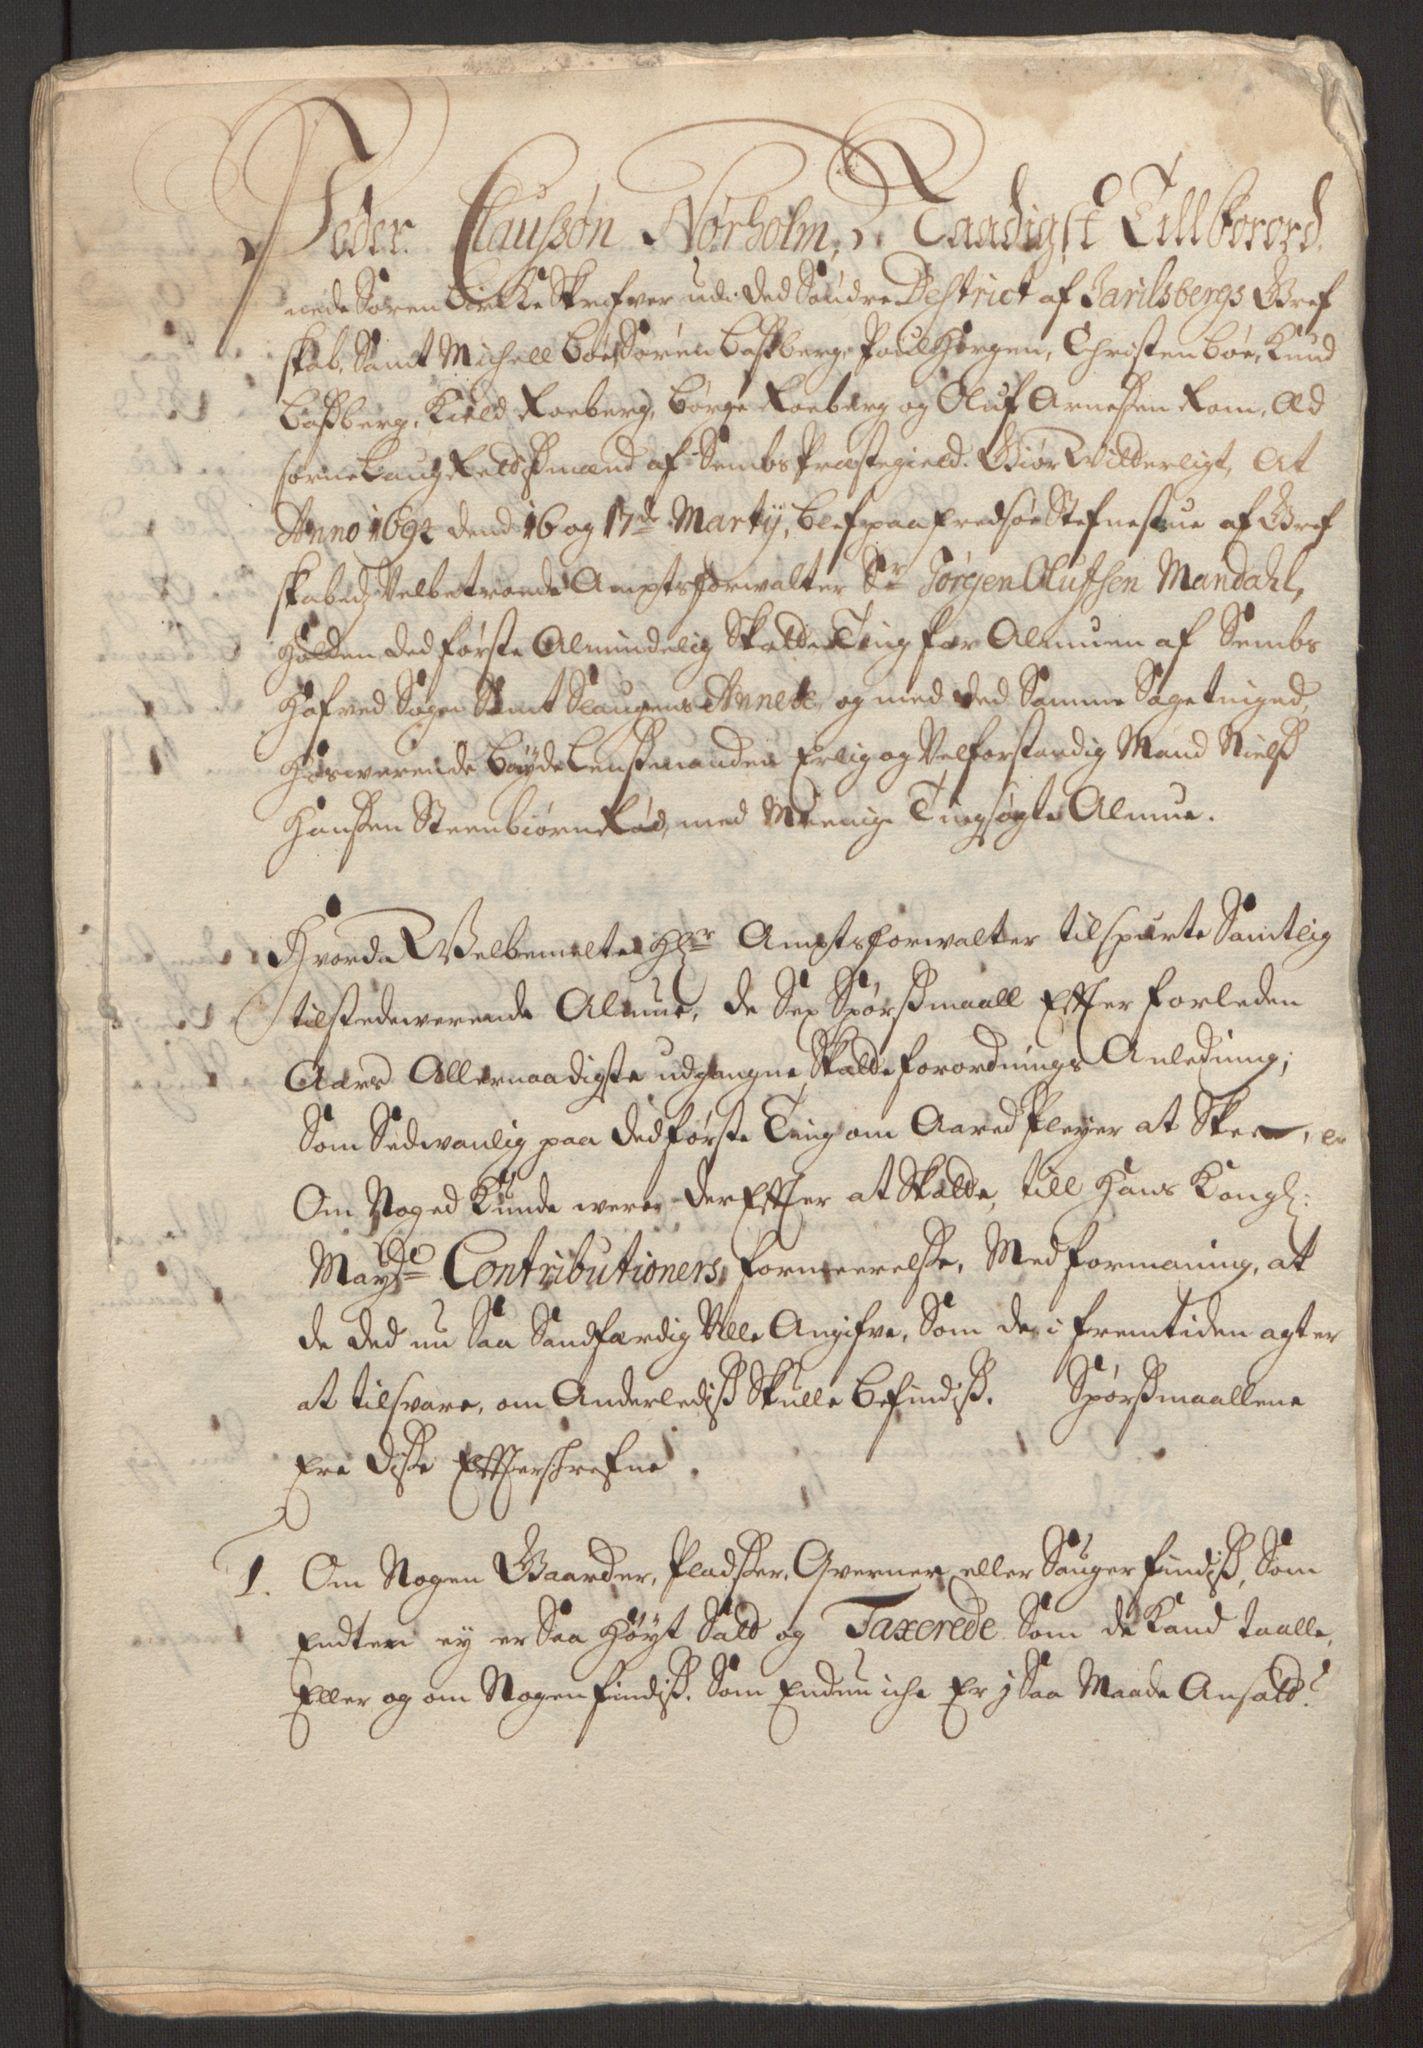 RA, Rentekammeret inntil 1814, Reviderte regnskaper, Fogderegnskap, R32/L1867: Fogderegnskap Jarlsberg grevskap, 1694-1696, s. 48